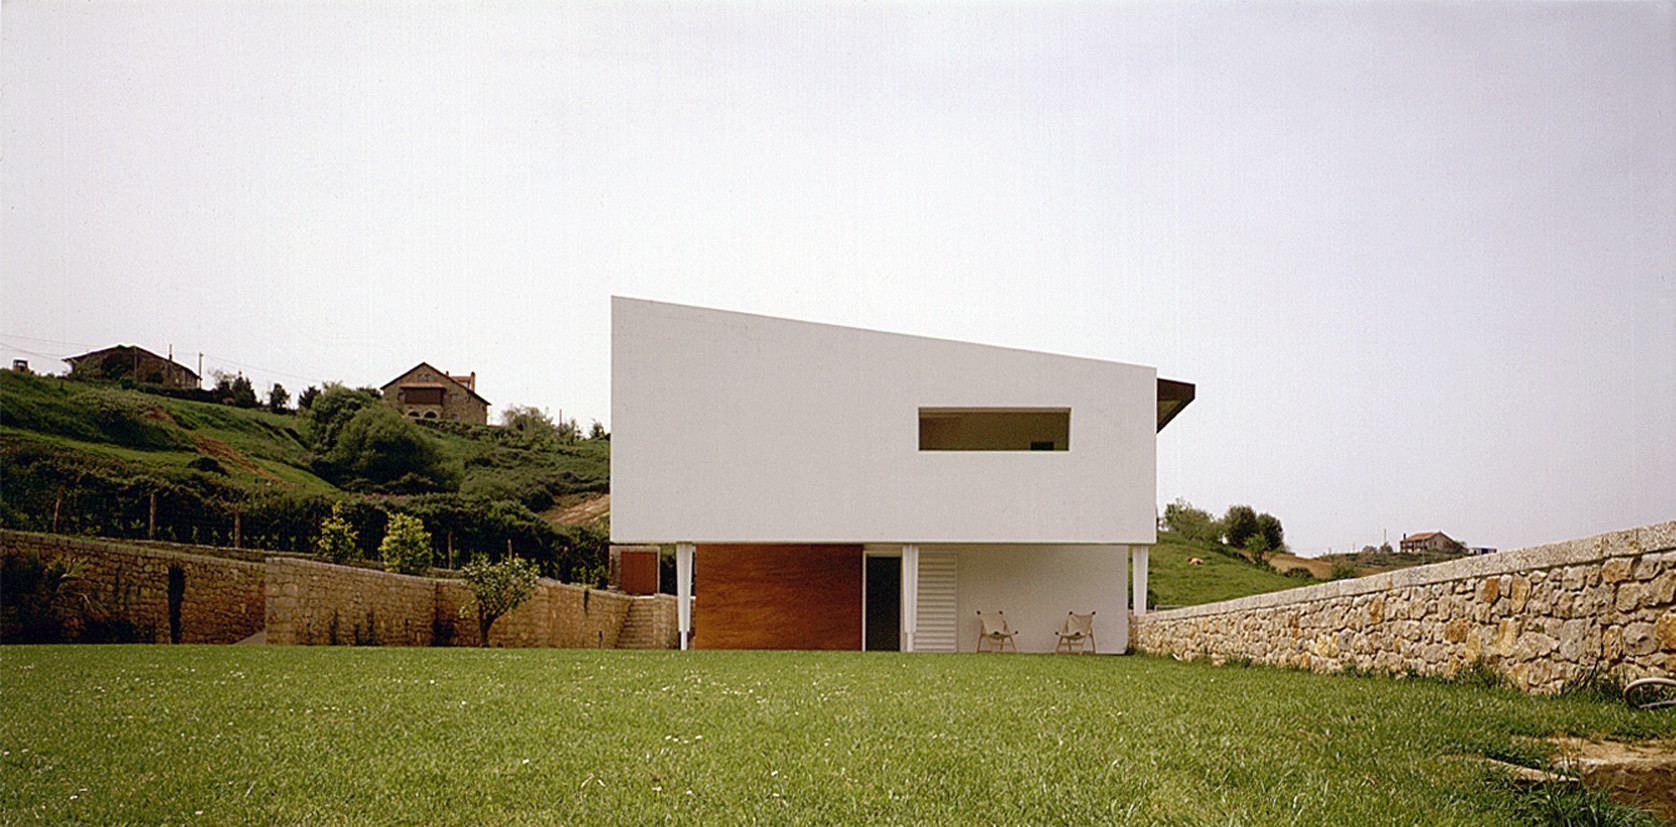 Galer a de vivienda unifamiliar en ruise ada ru z larrea for Casa minimalista la plata